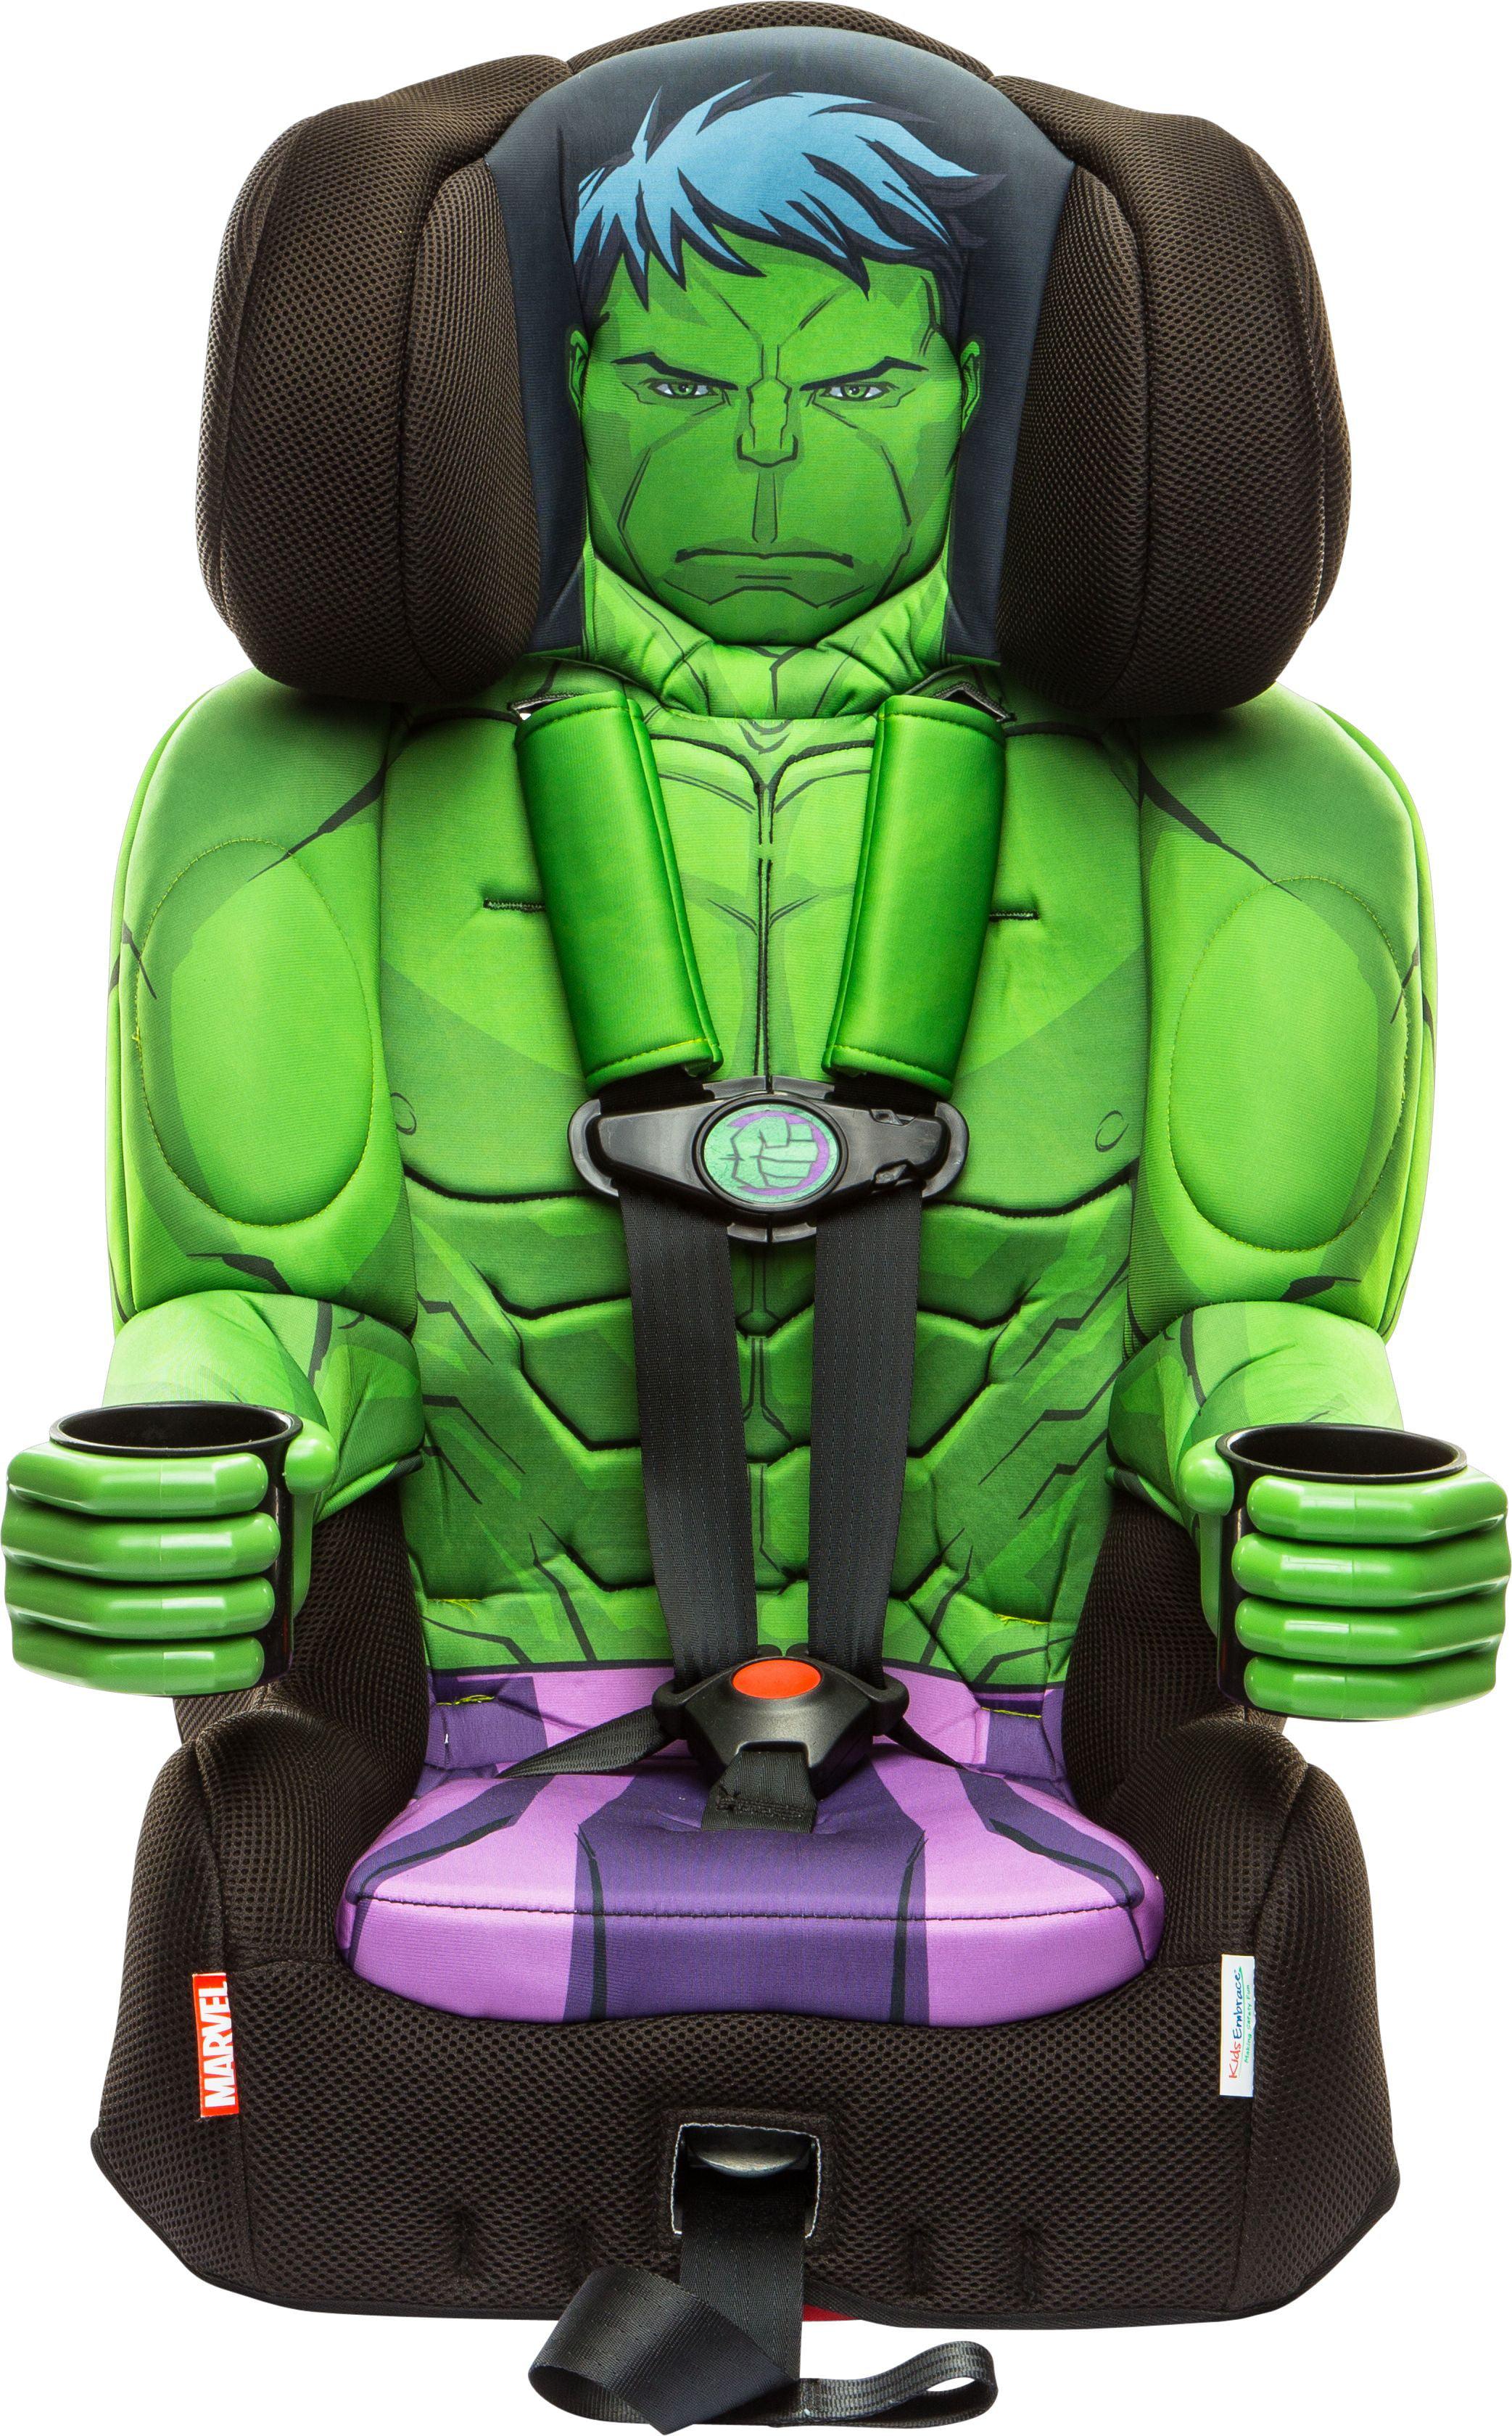 KidsEmbrace Marvel Avengers Incredible Hulk Combination Harness Booster Car Seat by KidsEmbrace